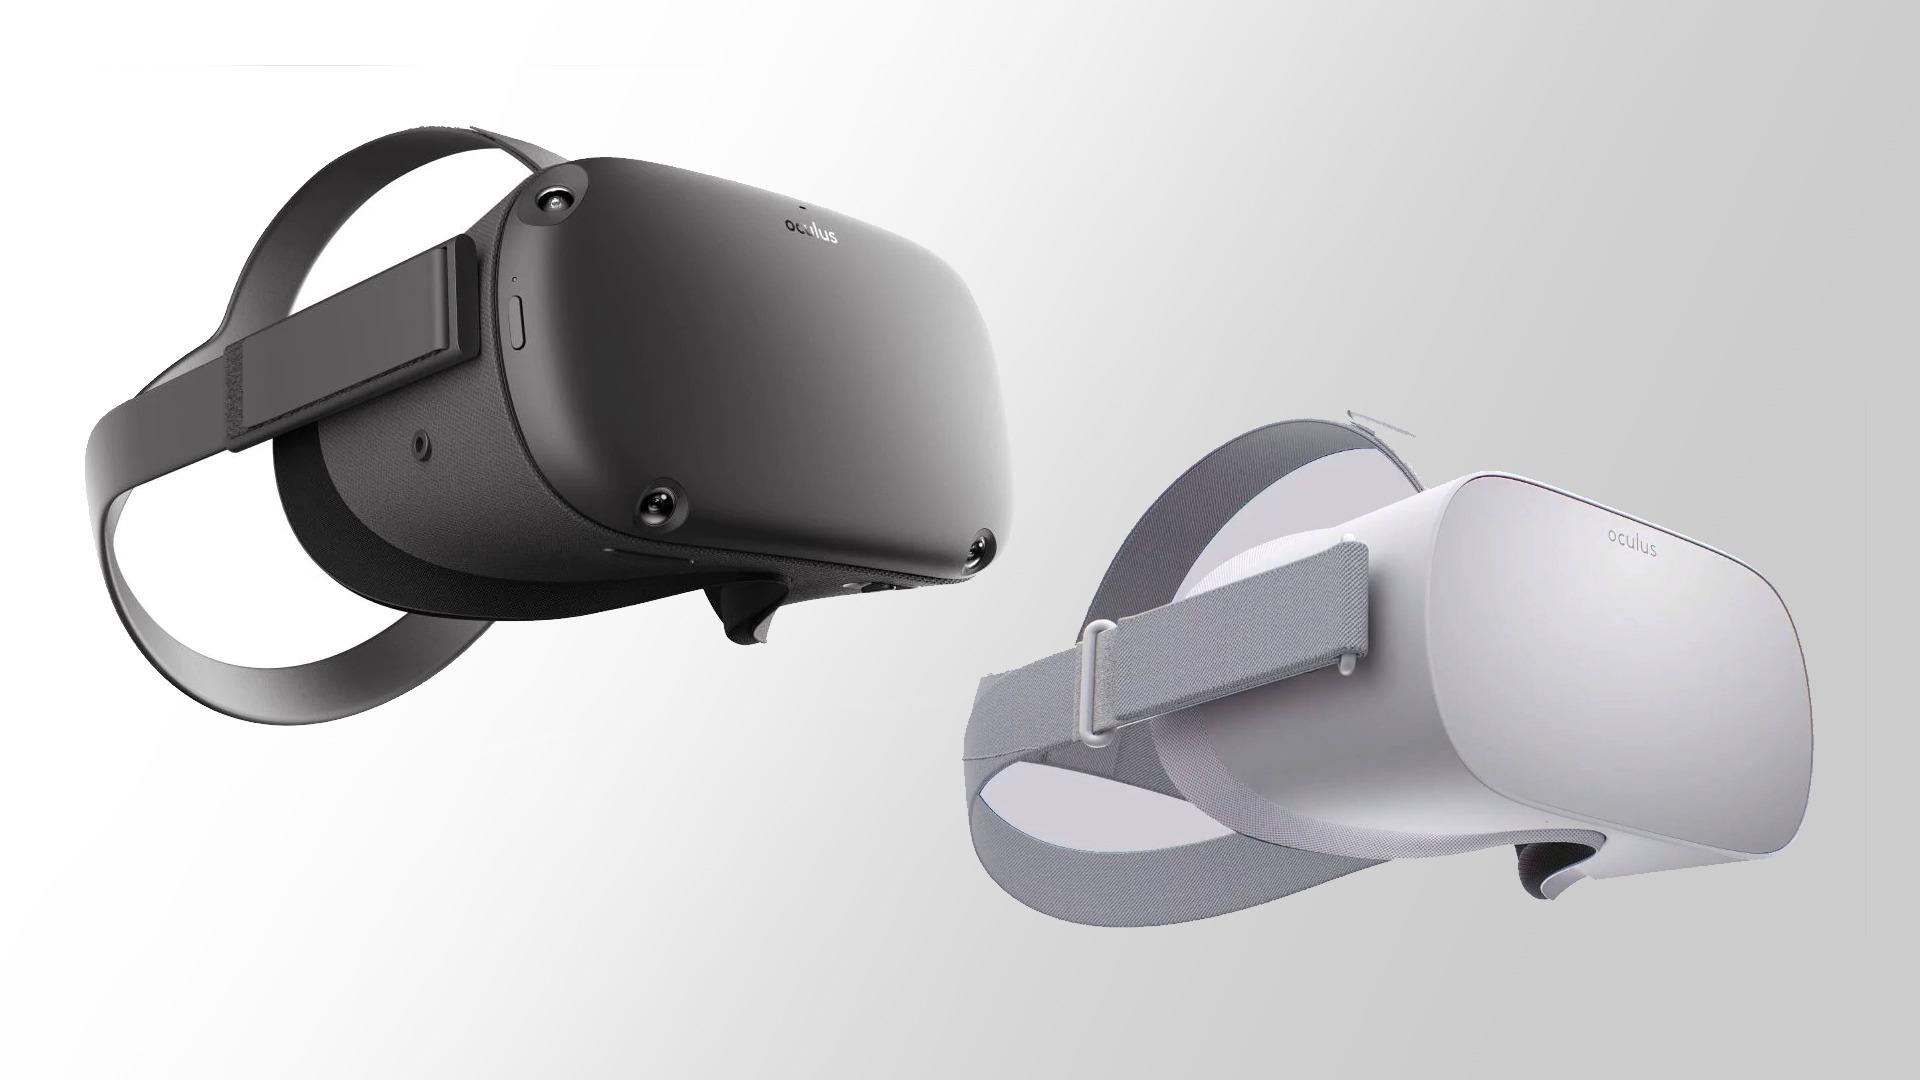 Jön az Oculus Go emulátor Questre